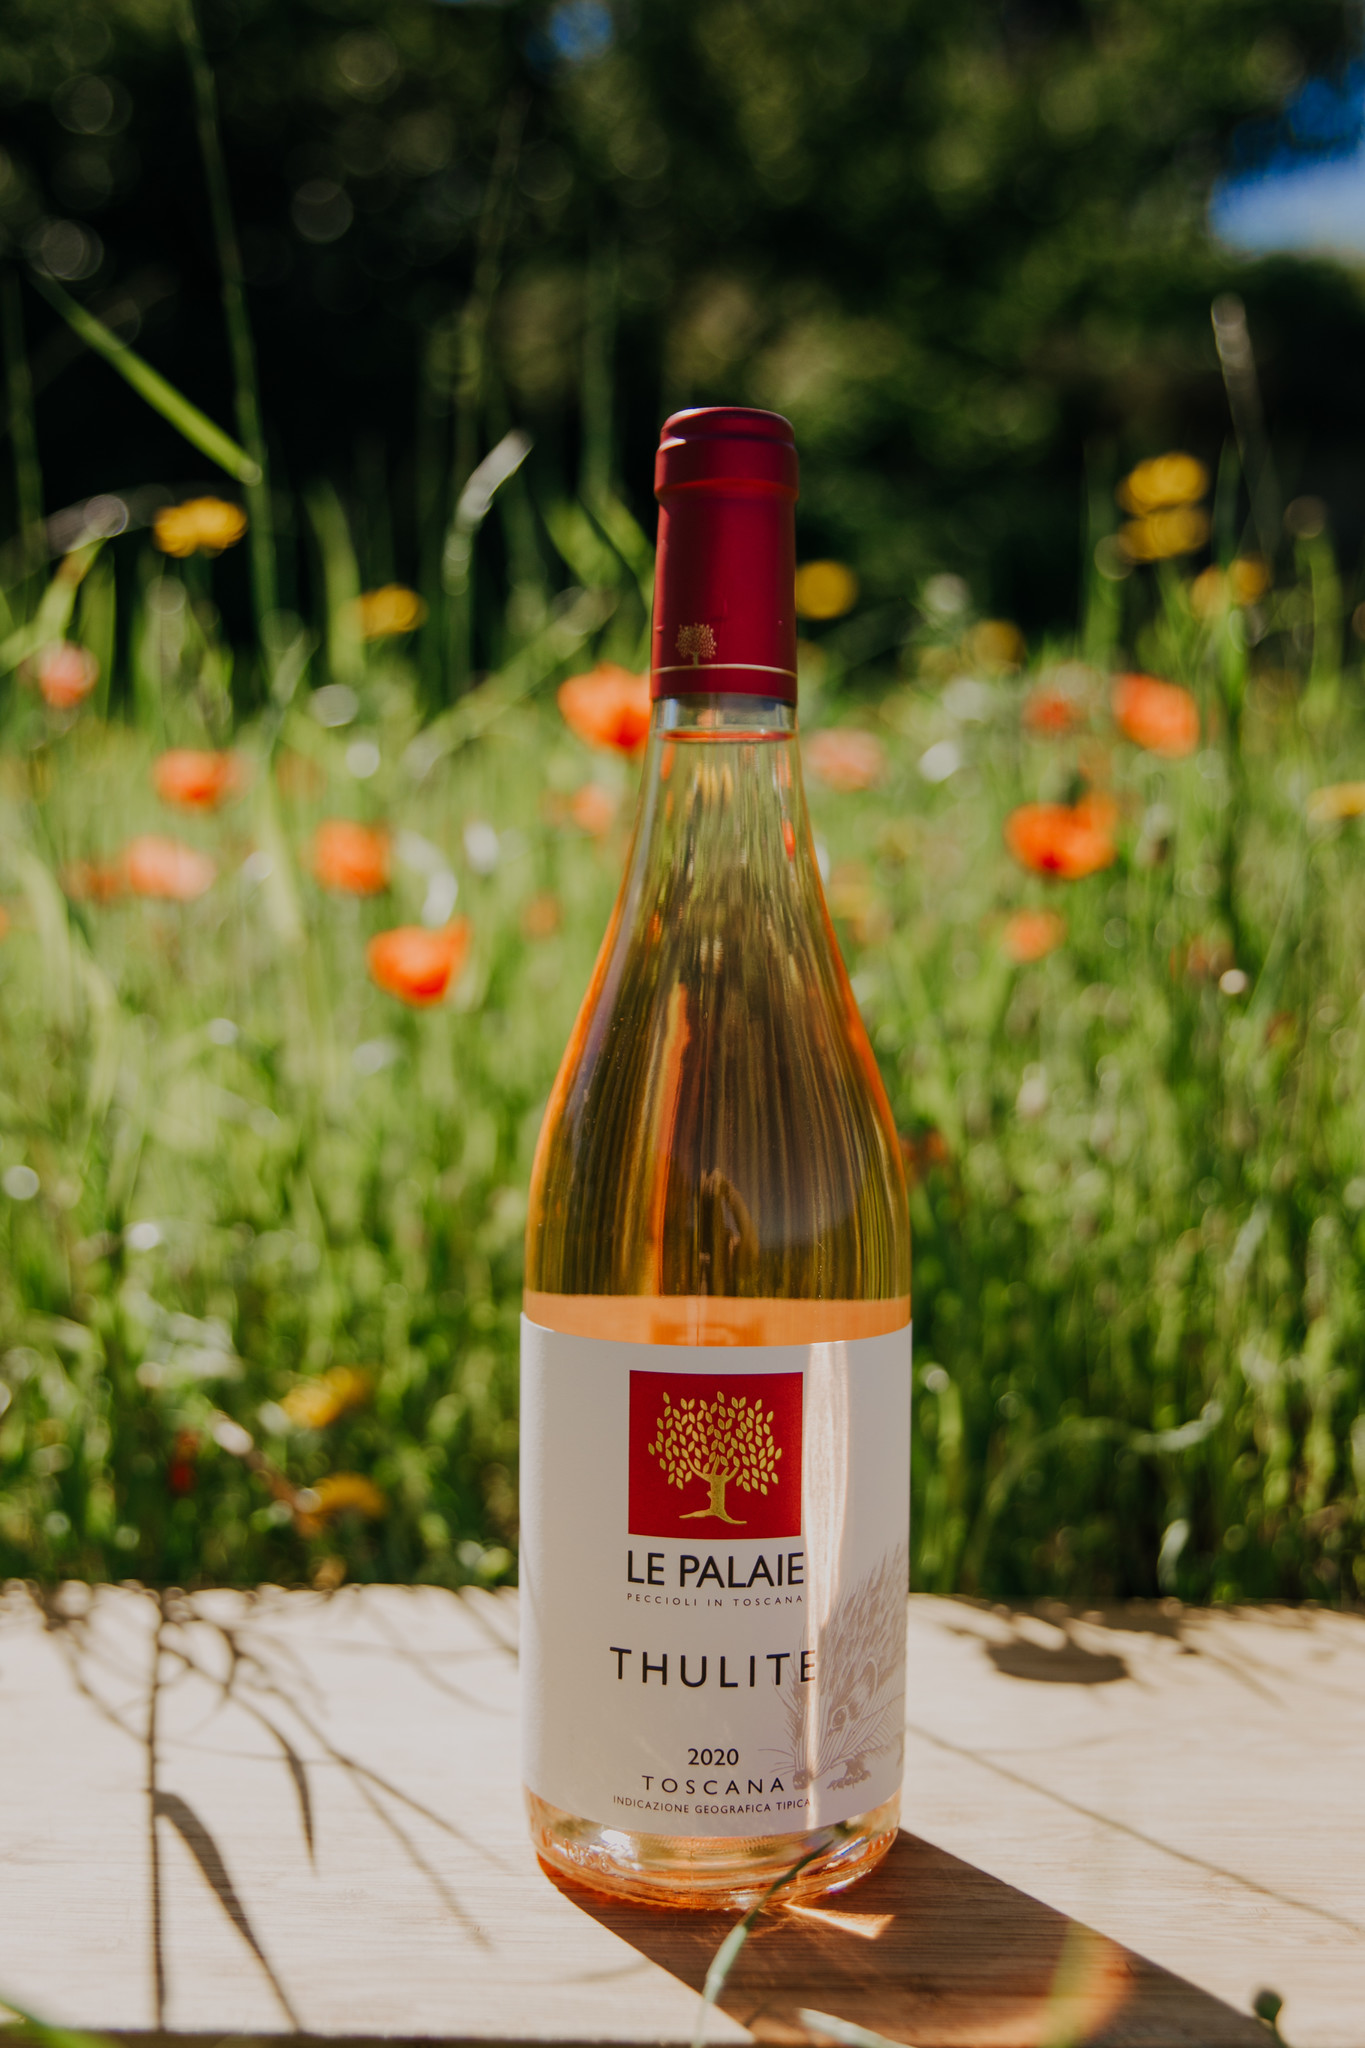 Le Palaie Thulite 2020 - Rosato di Toscana Igt